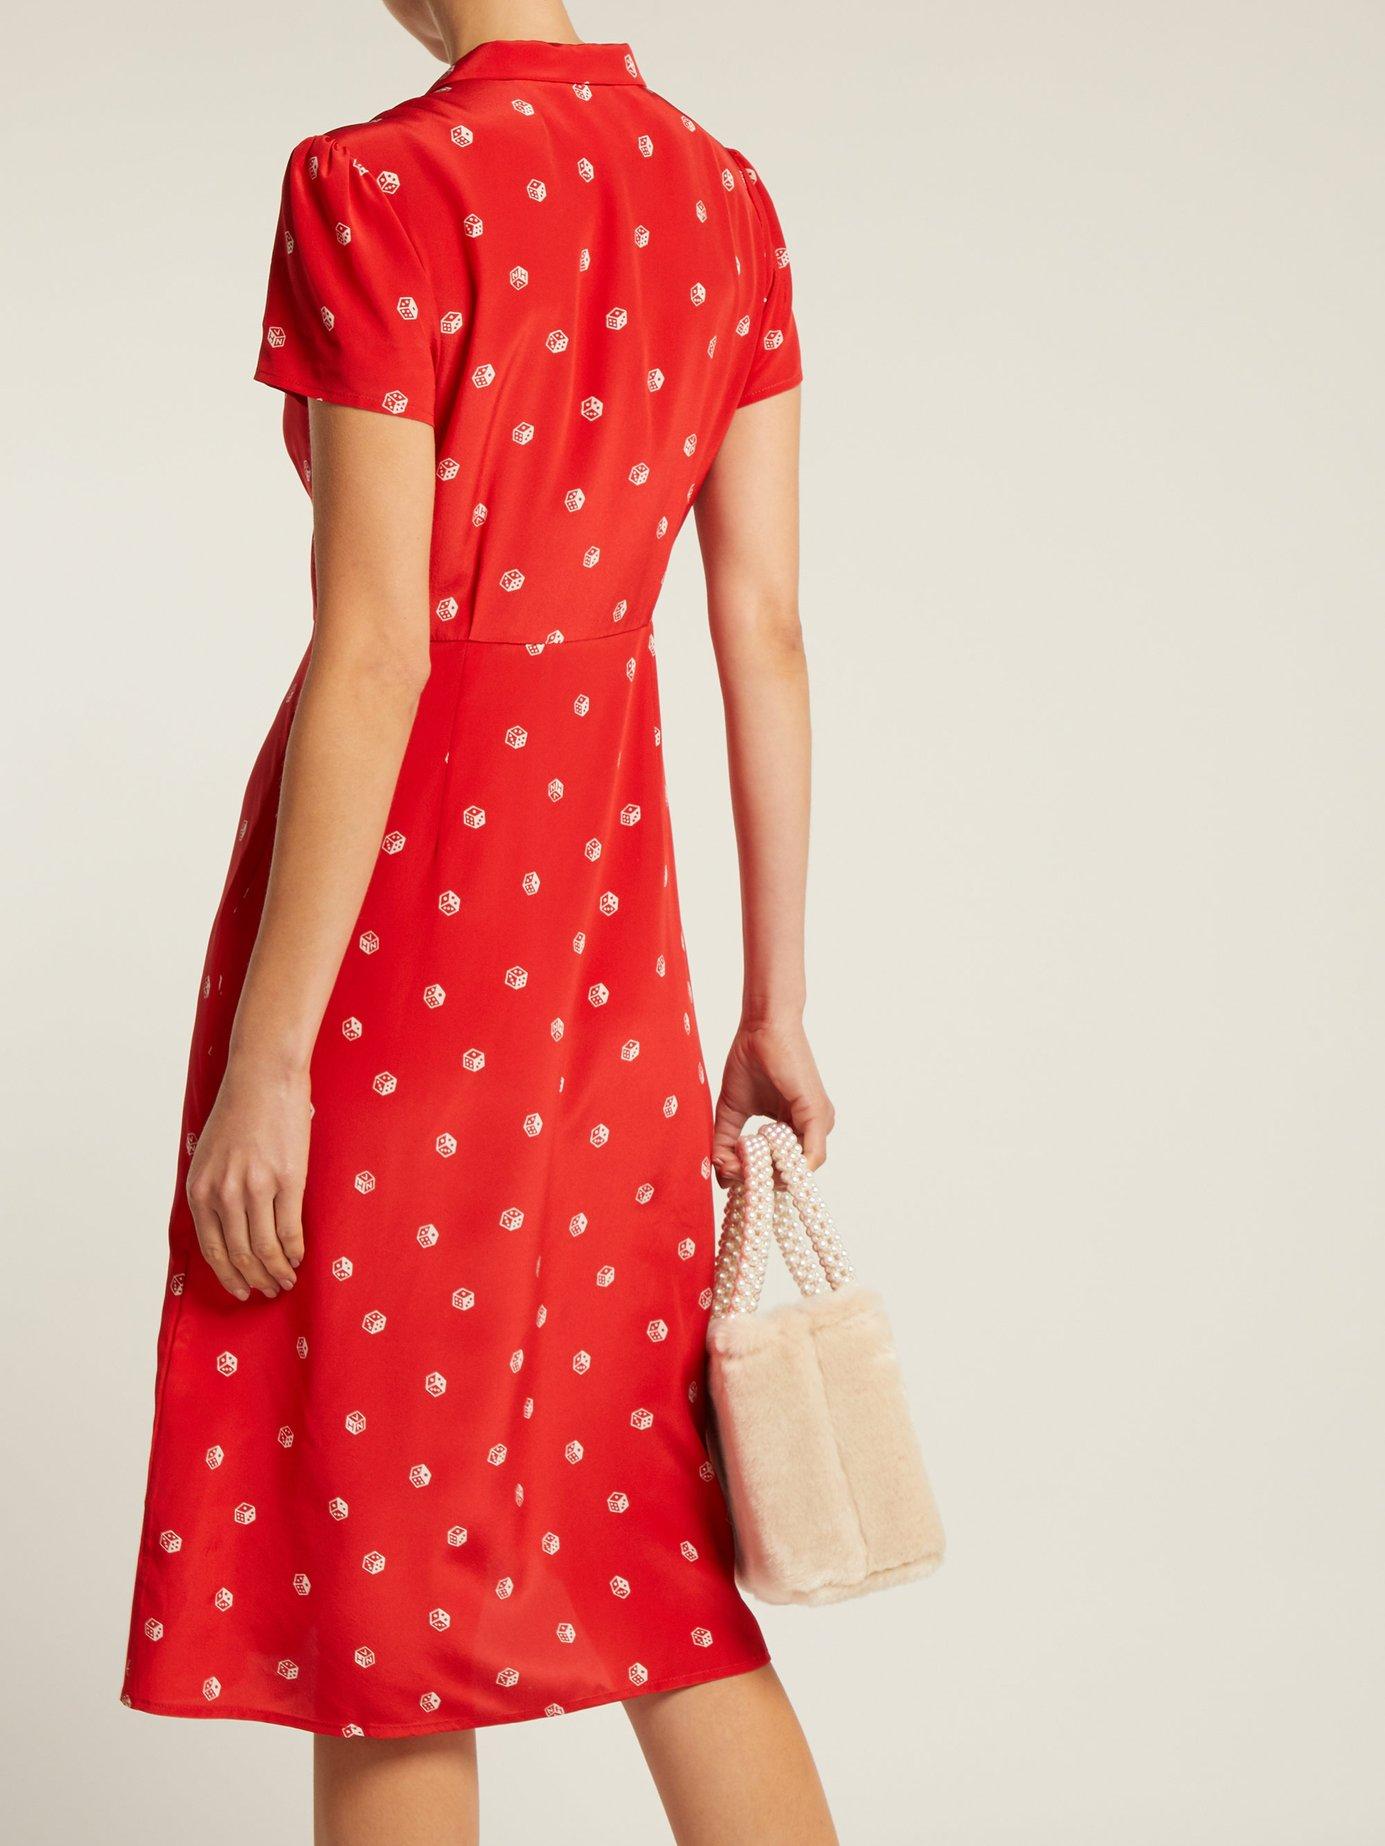 Morgan dice-print silk midi dress by Hvn